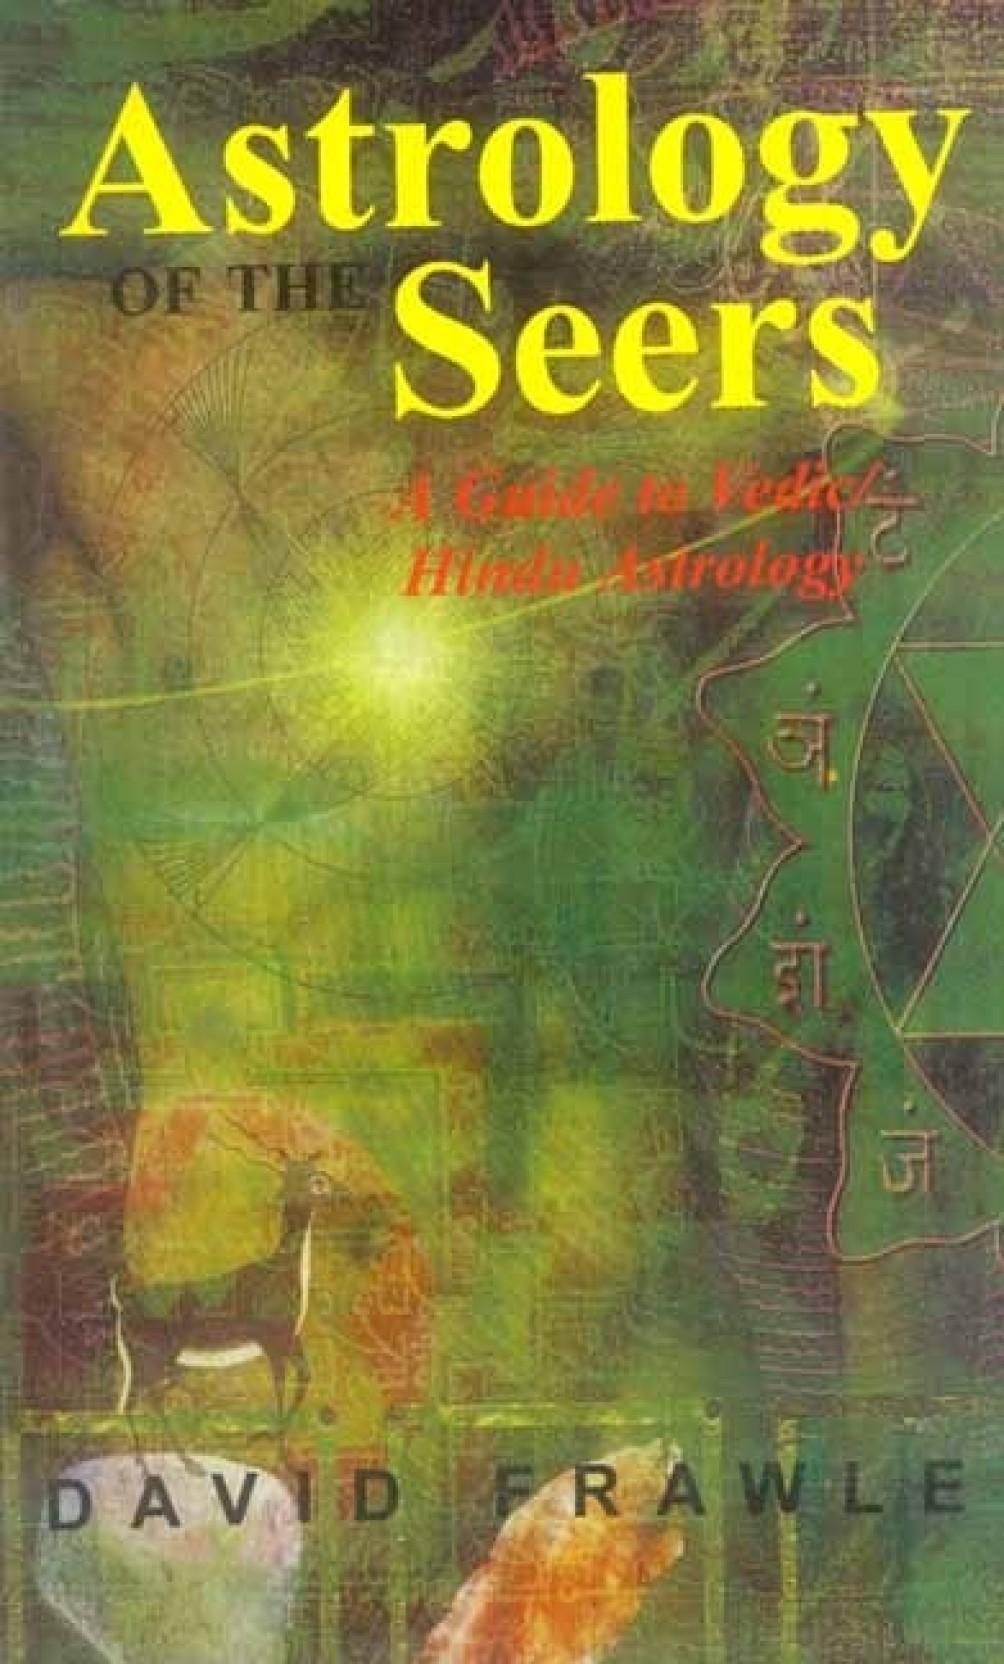 astrology of the seers a guide to vedic hindu astrology buy